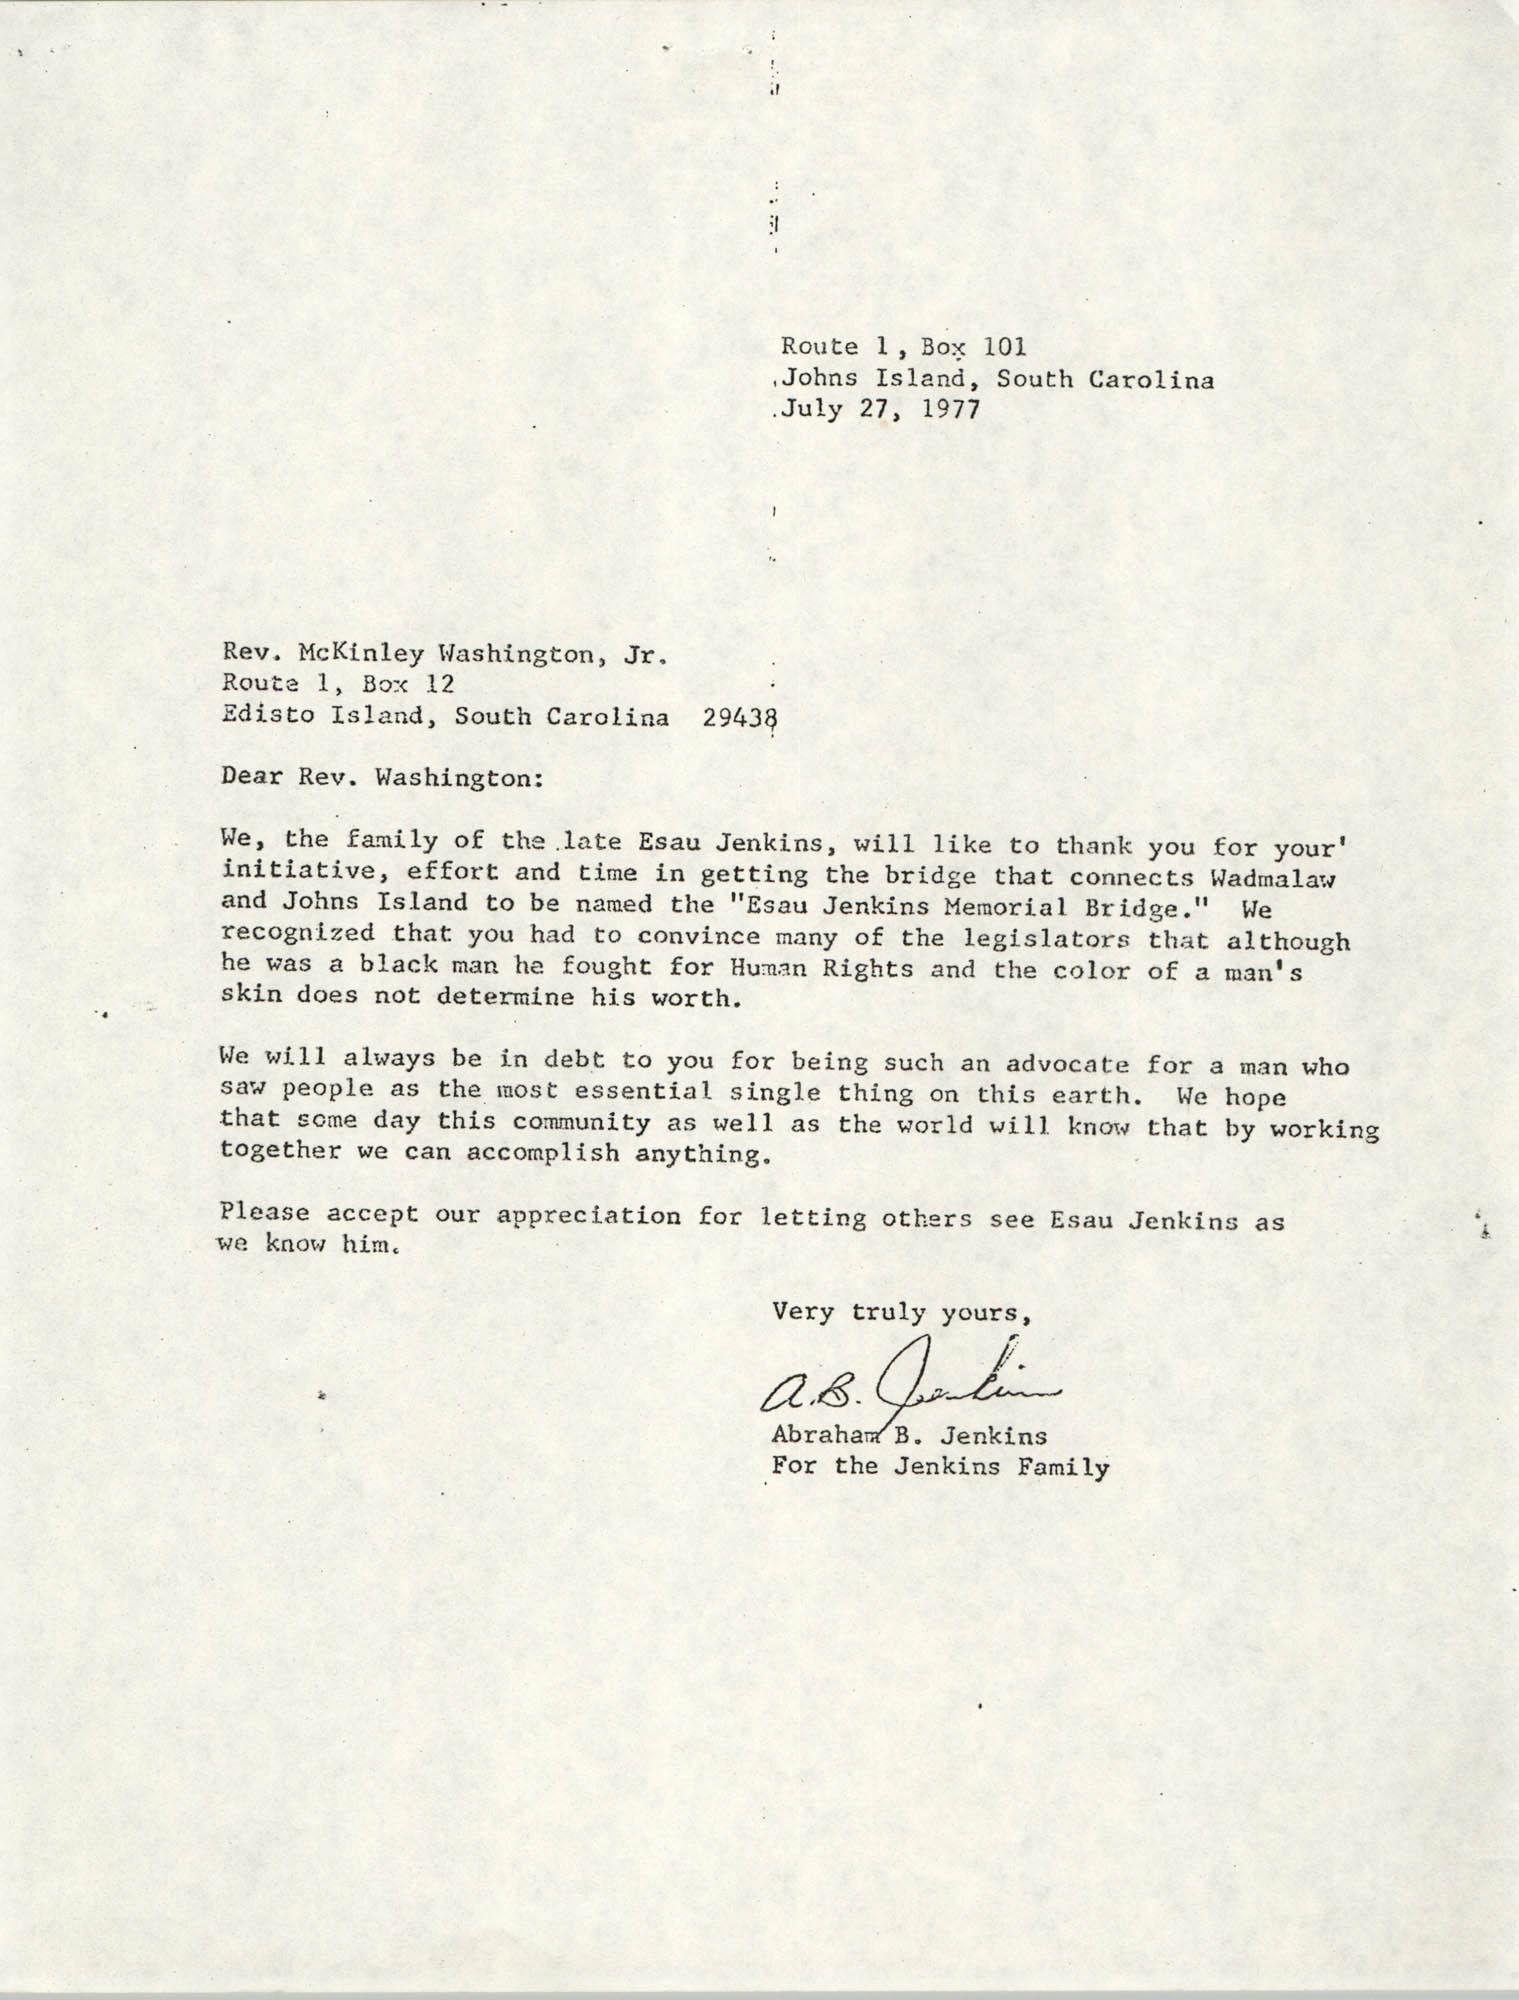 Letter from McKinley Washington, Jr. to Abraham B. Jenkins, July 27, 1977